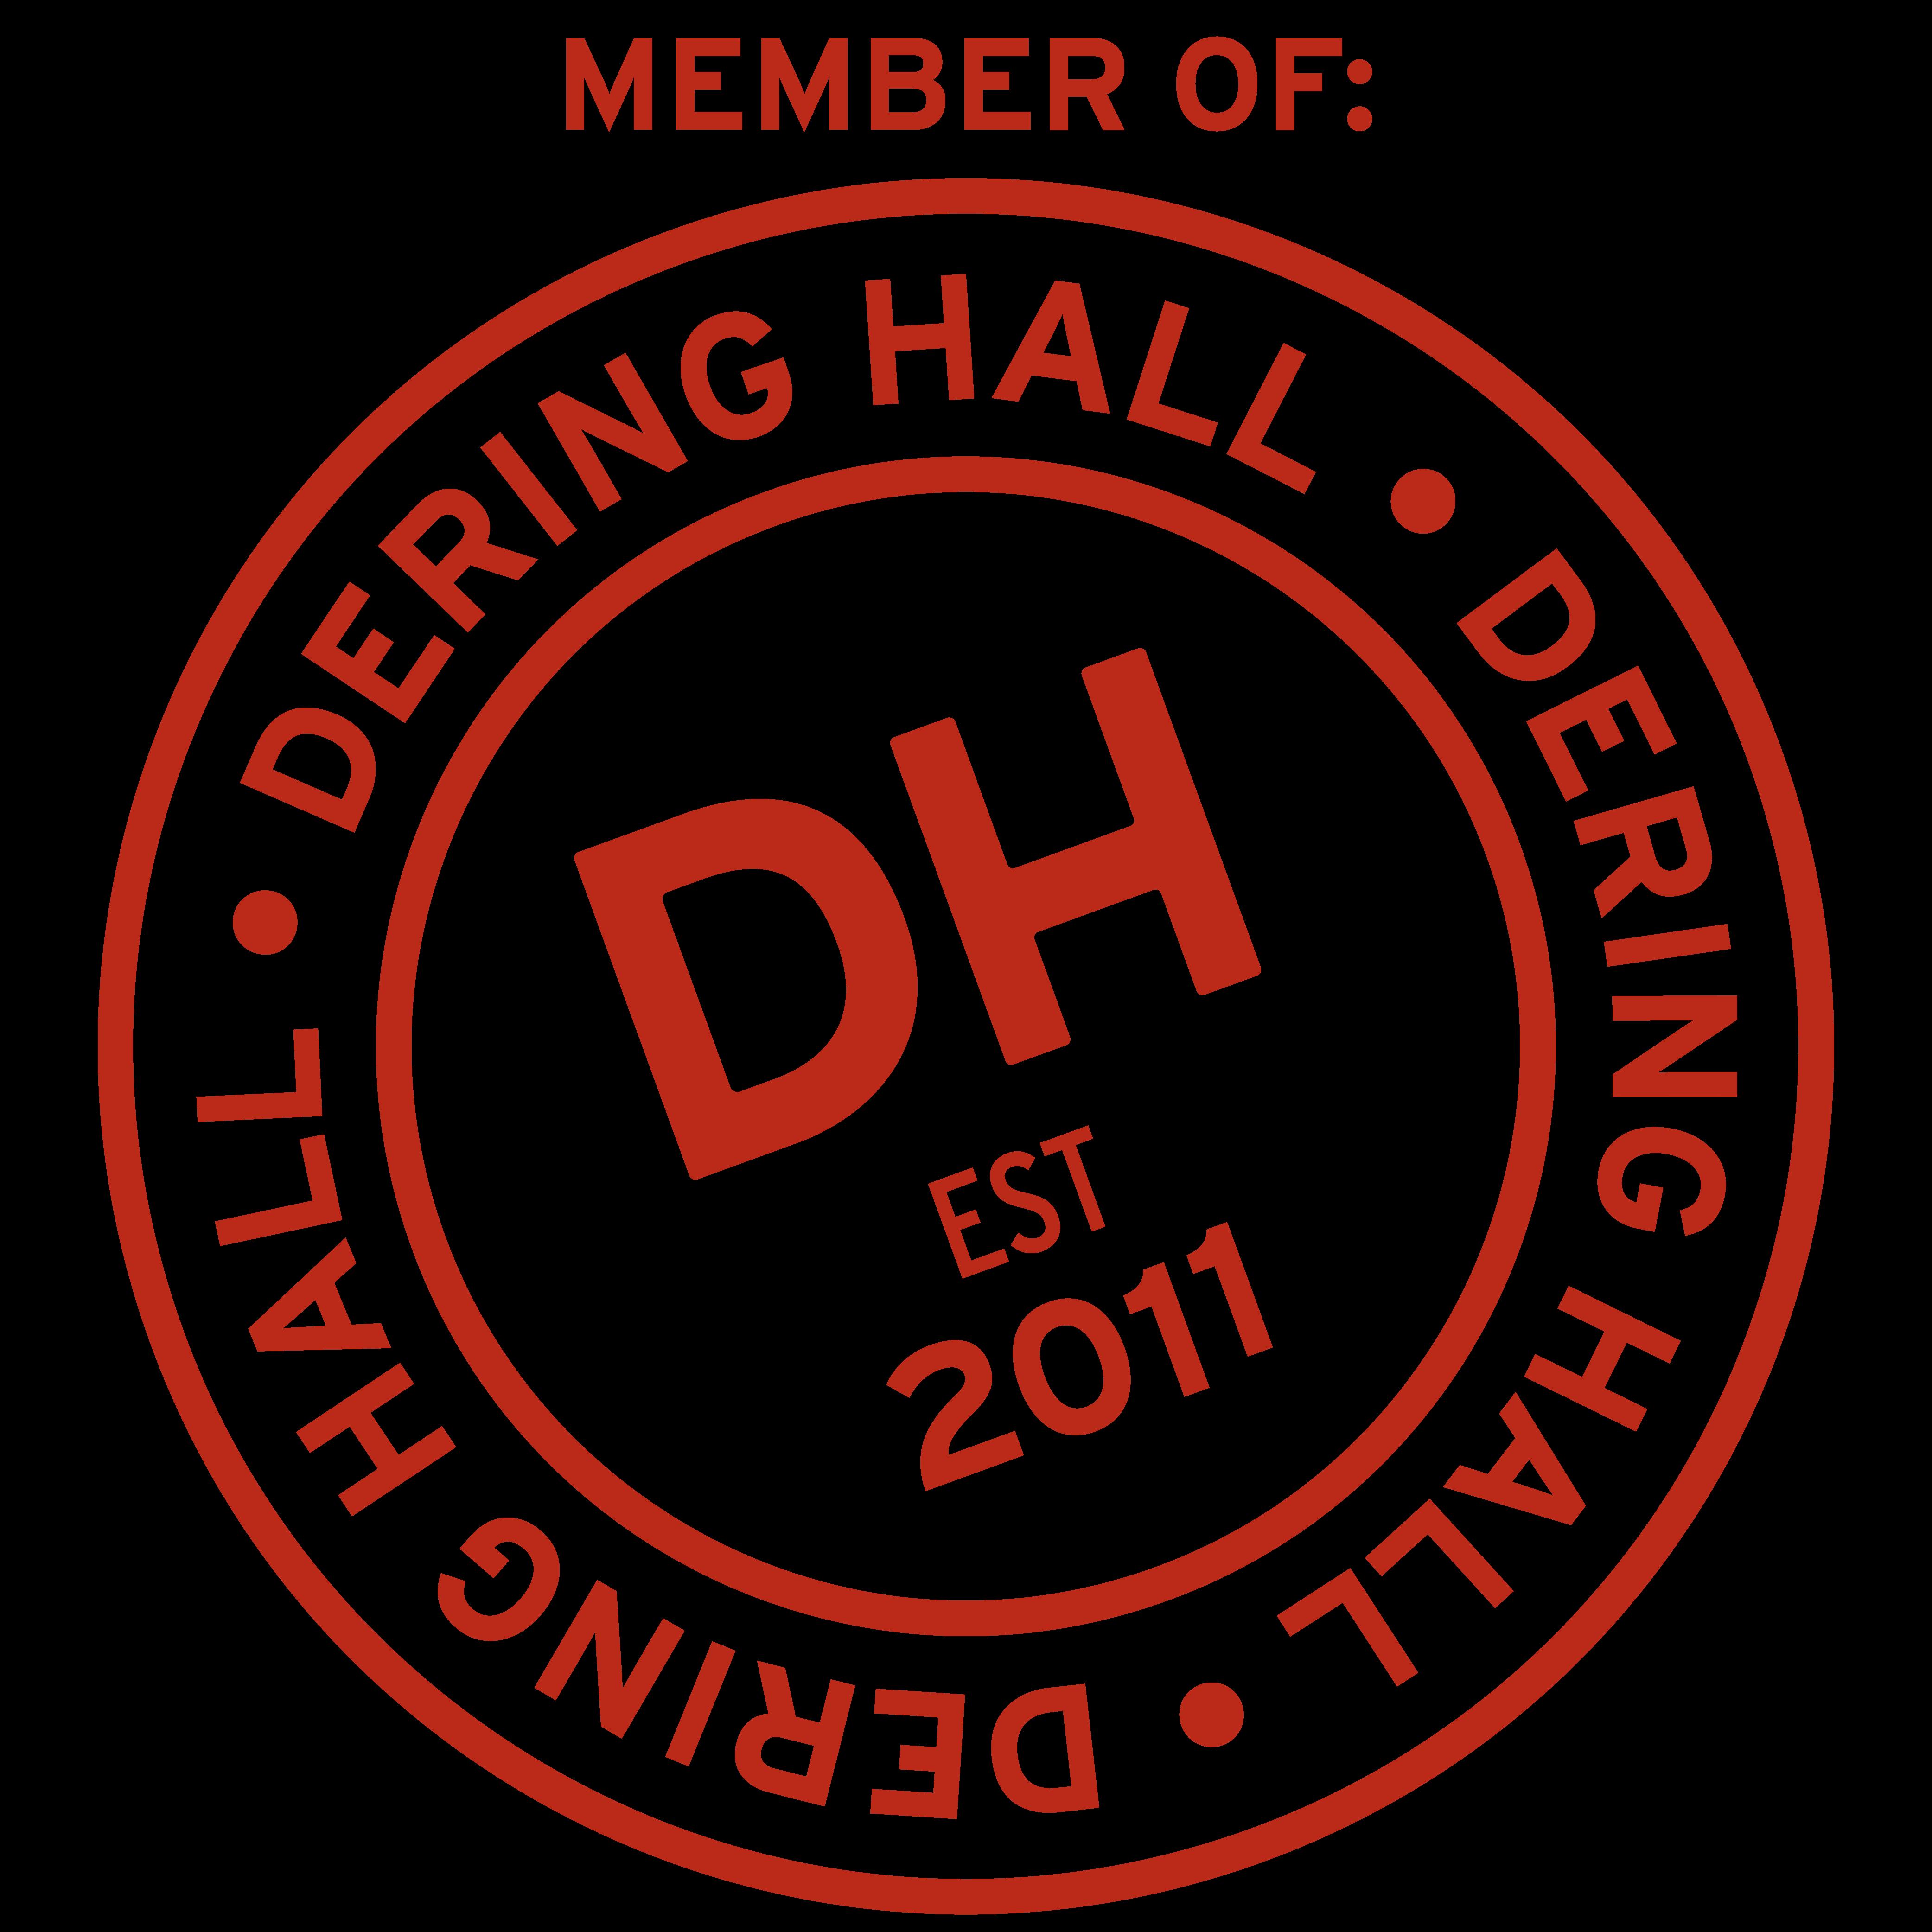 Dering Hall Logo